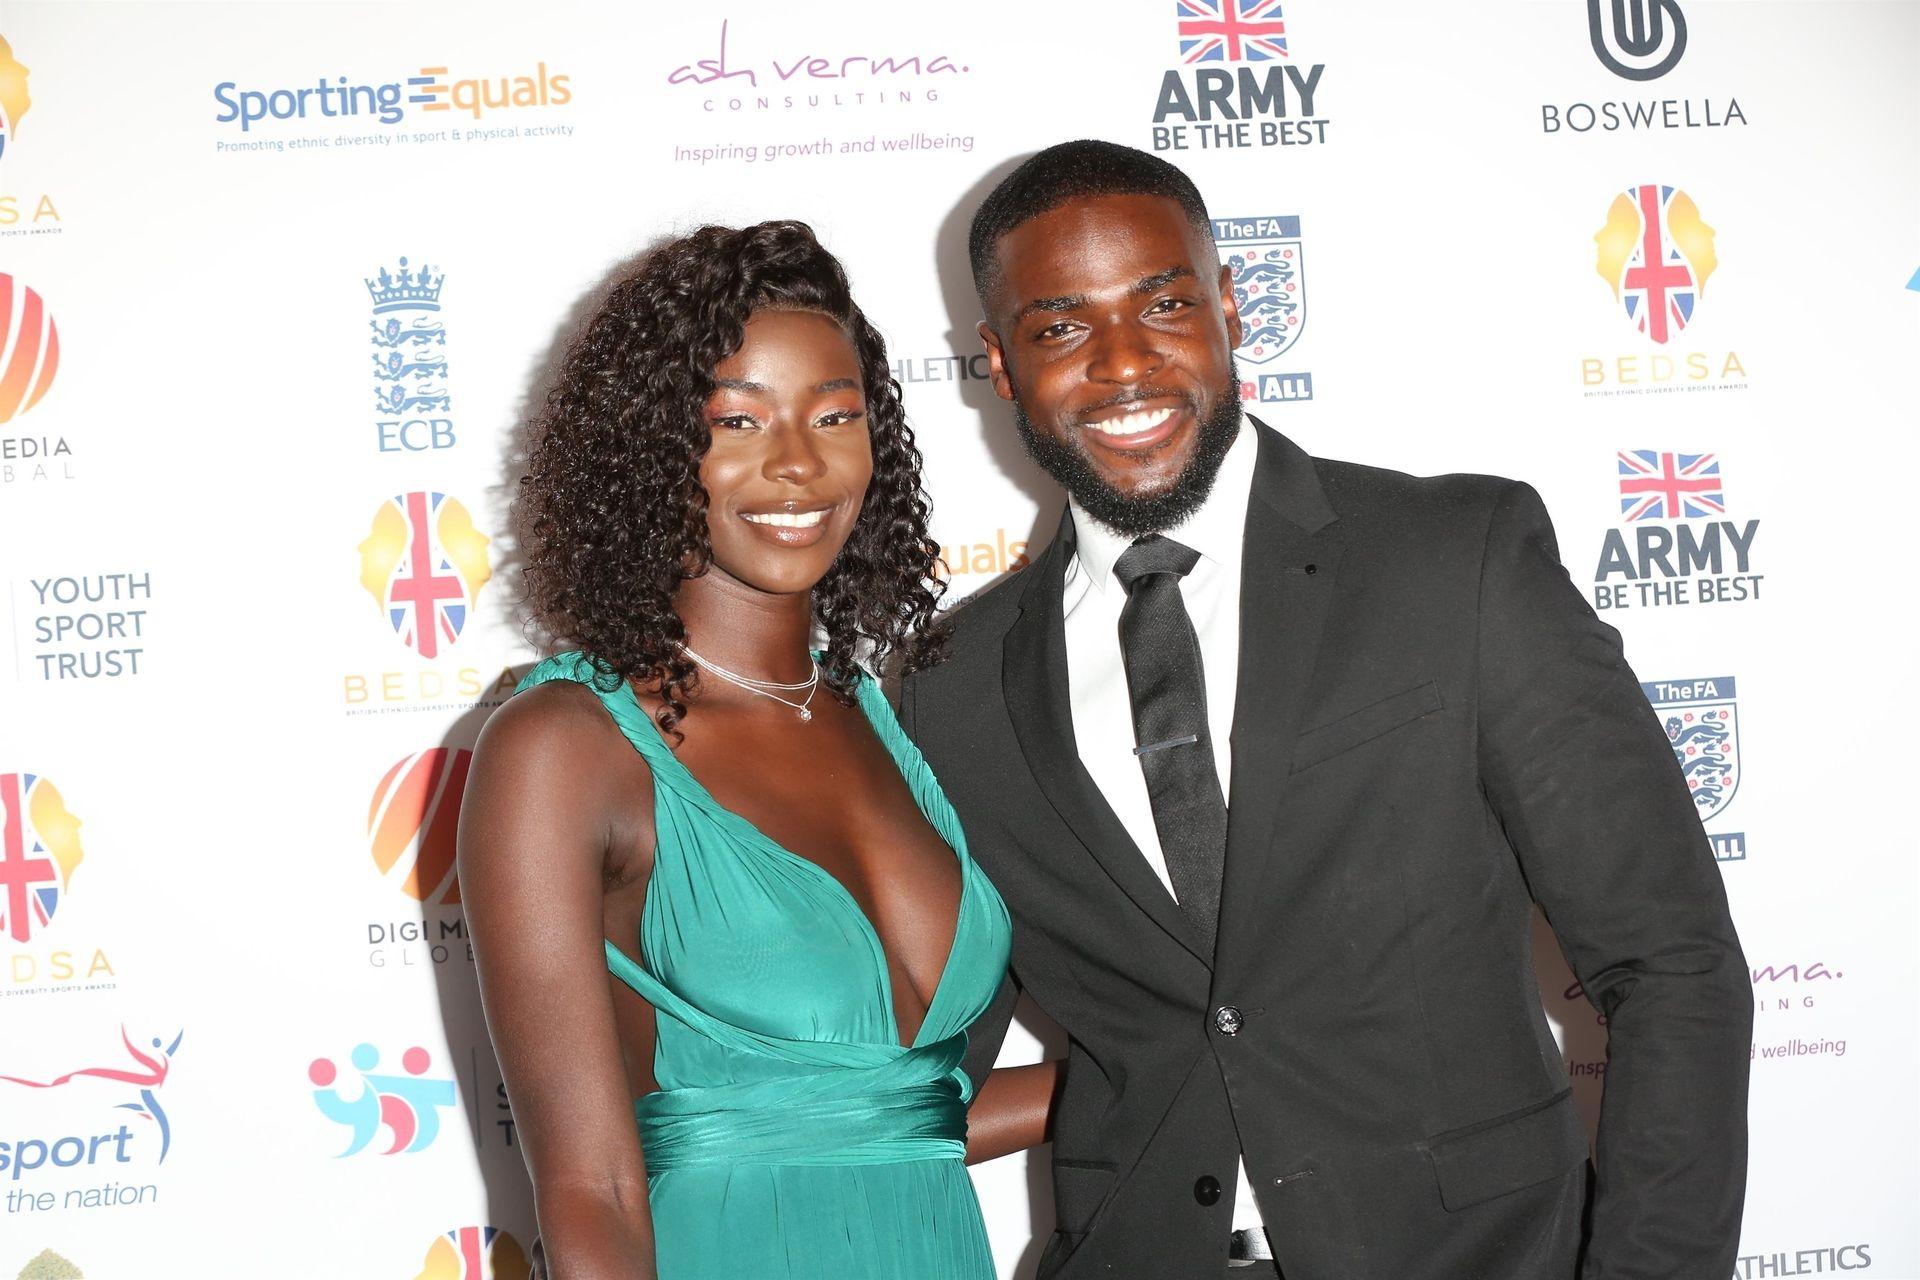 Mike Boateng & Priscilla Anyabu Are Seen At British Ethnic Diversity Sports Awards 0015